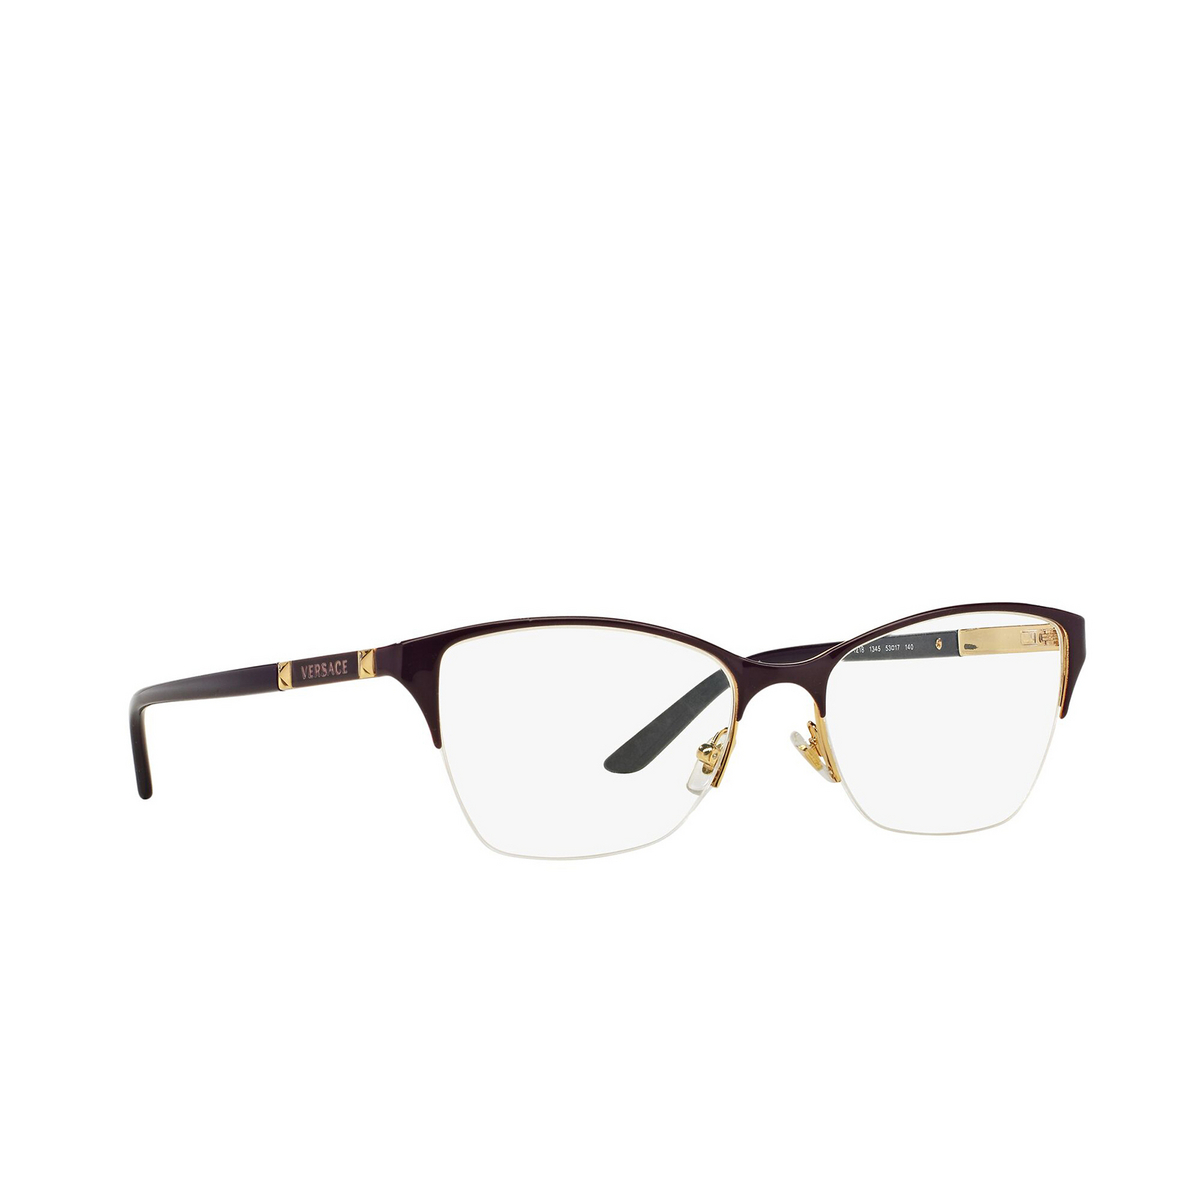 Versace® Cat-eye Eyeglasses: VE1218 color Violet / Gold 1345 - three-quarters view.